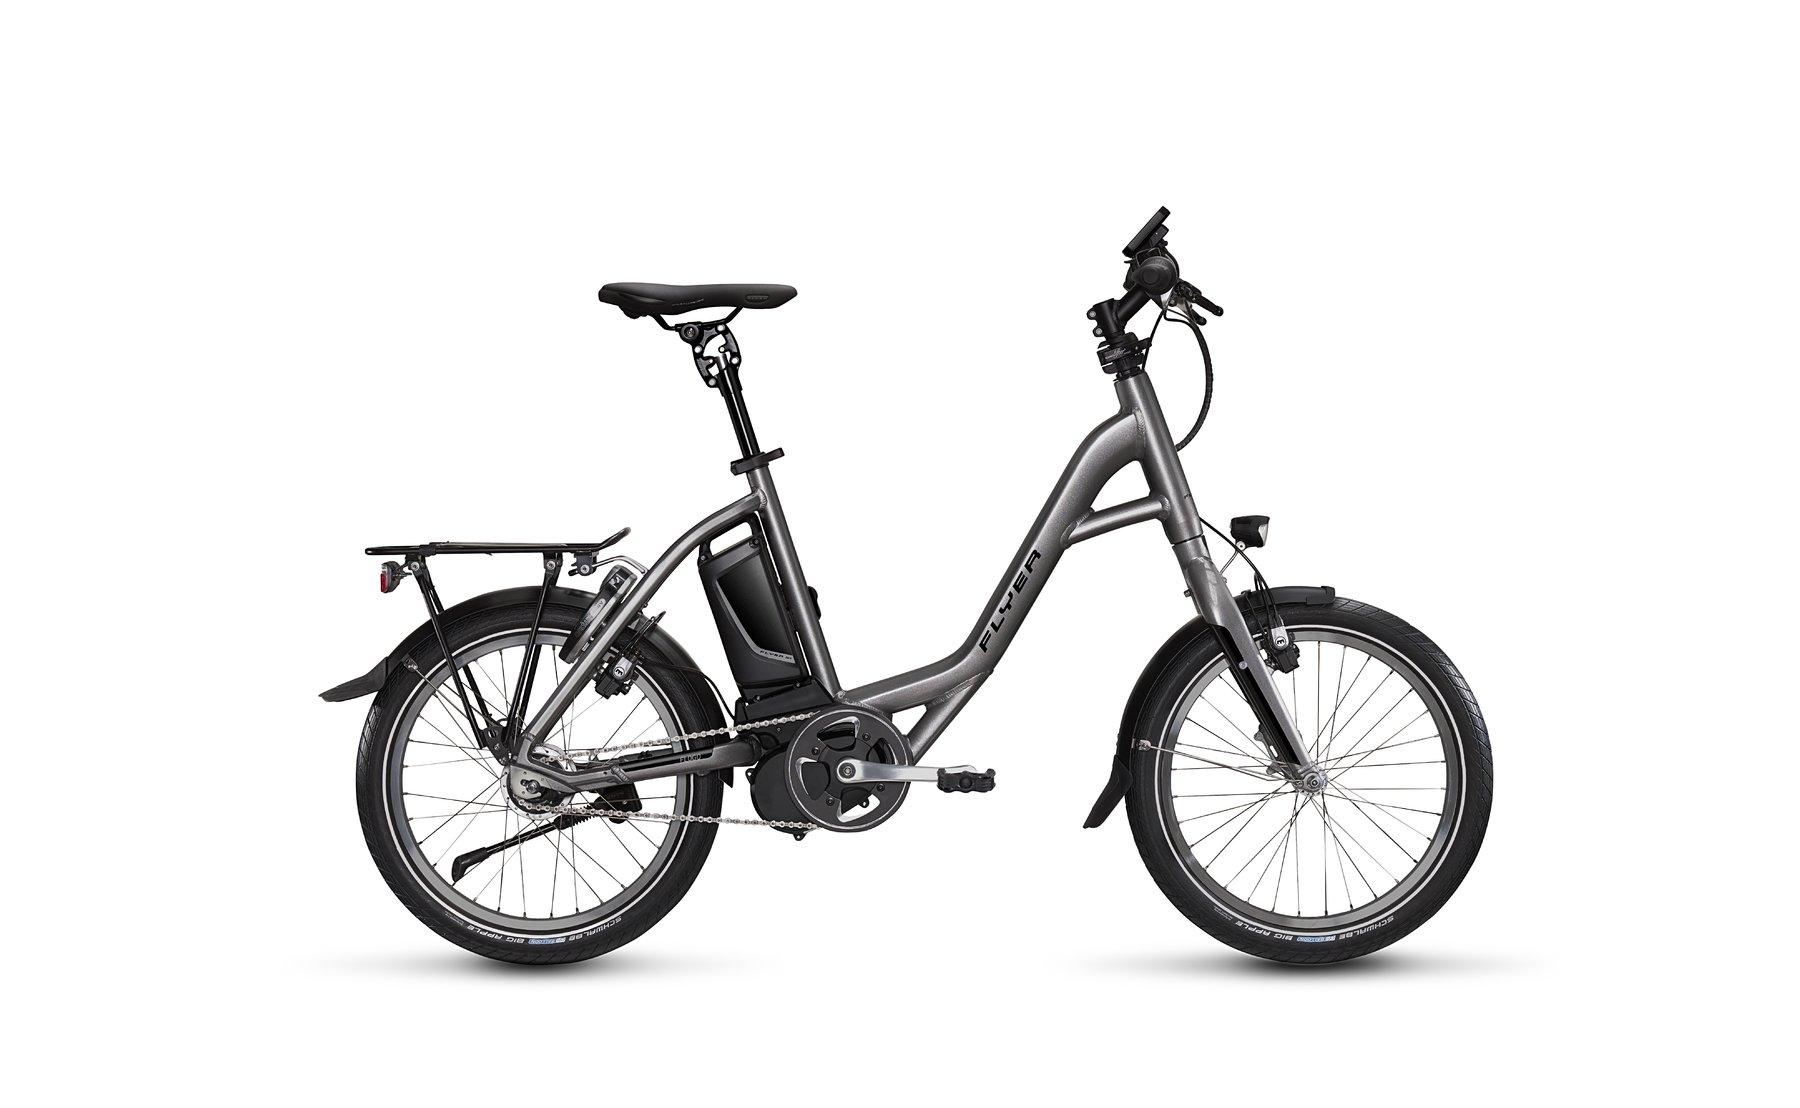 flyer flogo r 2015 20 zoll g nstig kaufen fahrrad xxl. Black Bedroom Furniture Sets. Home Design Ideas